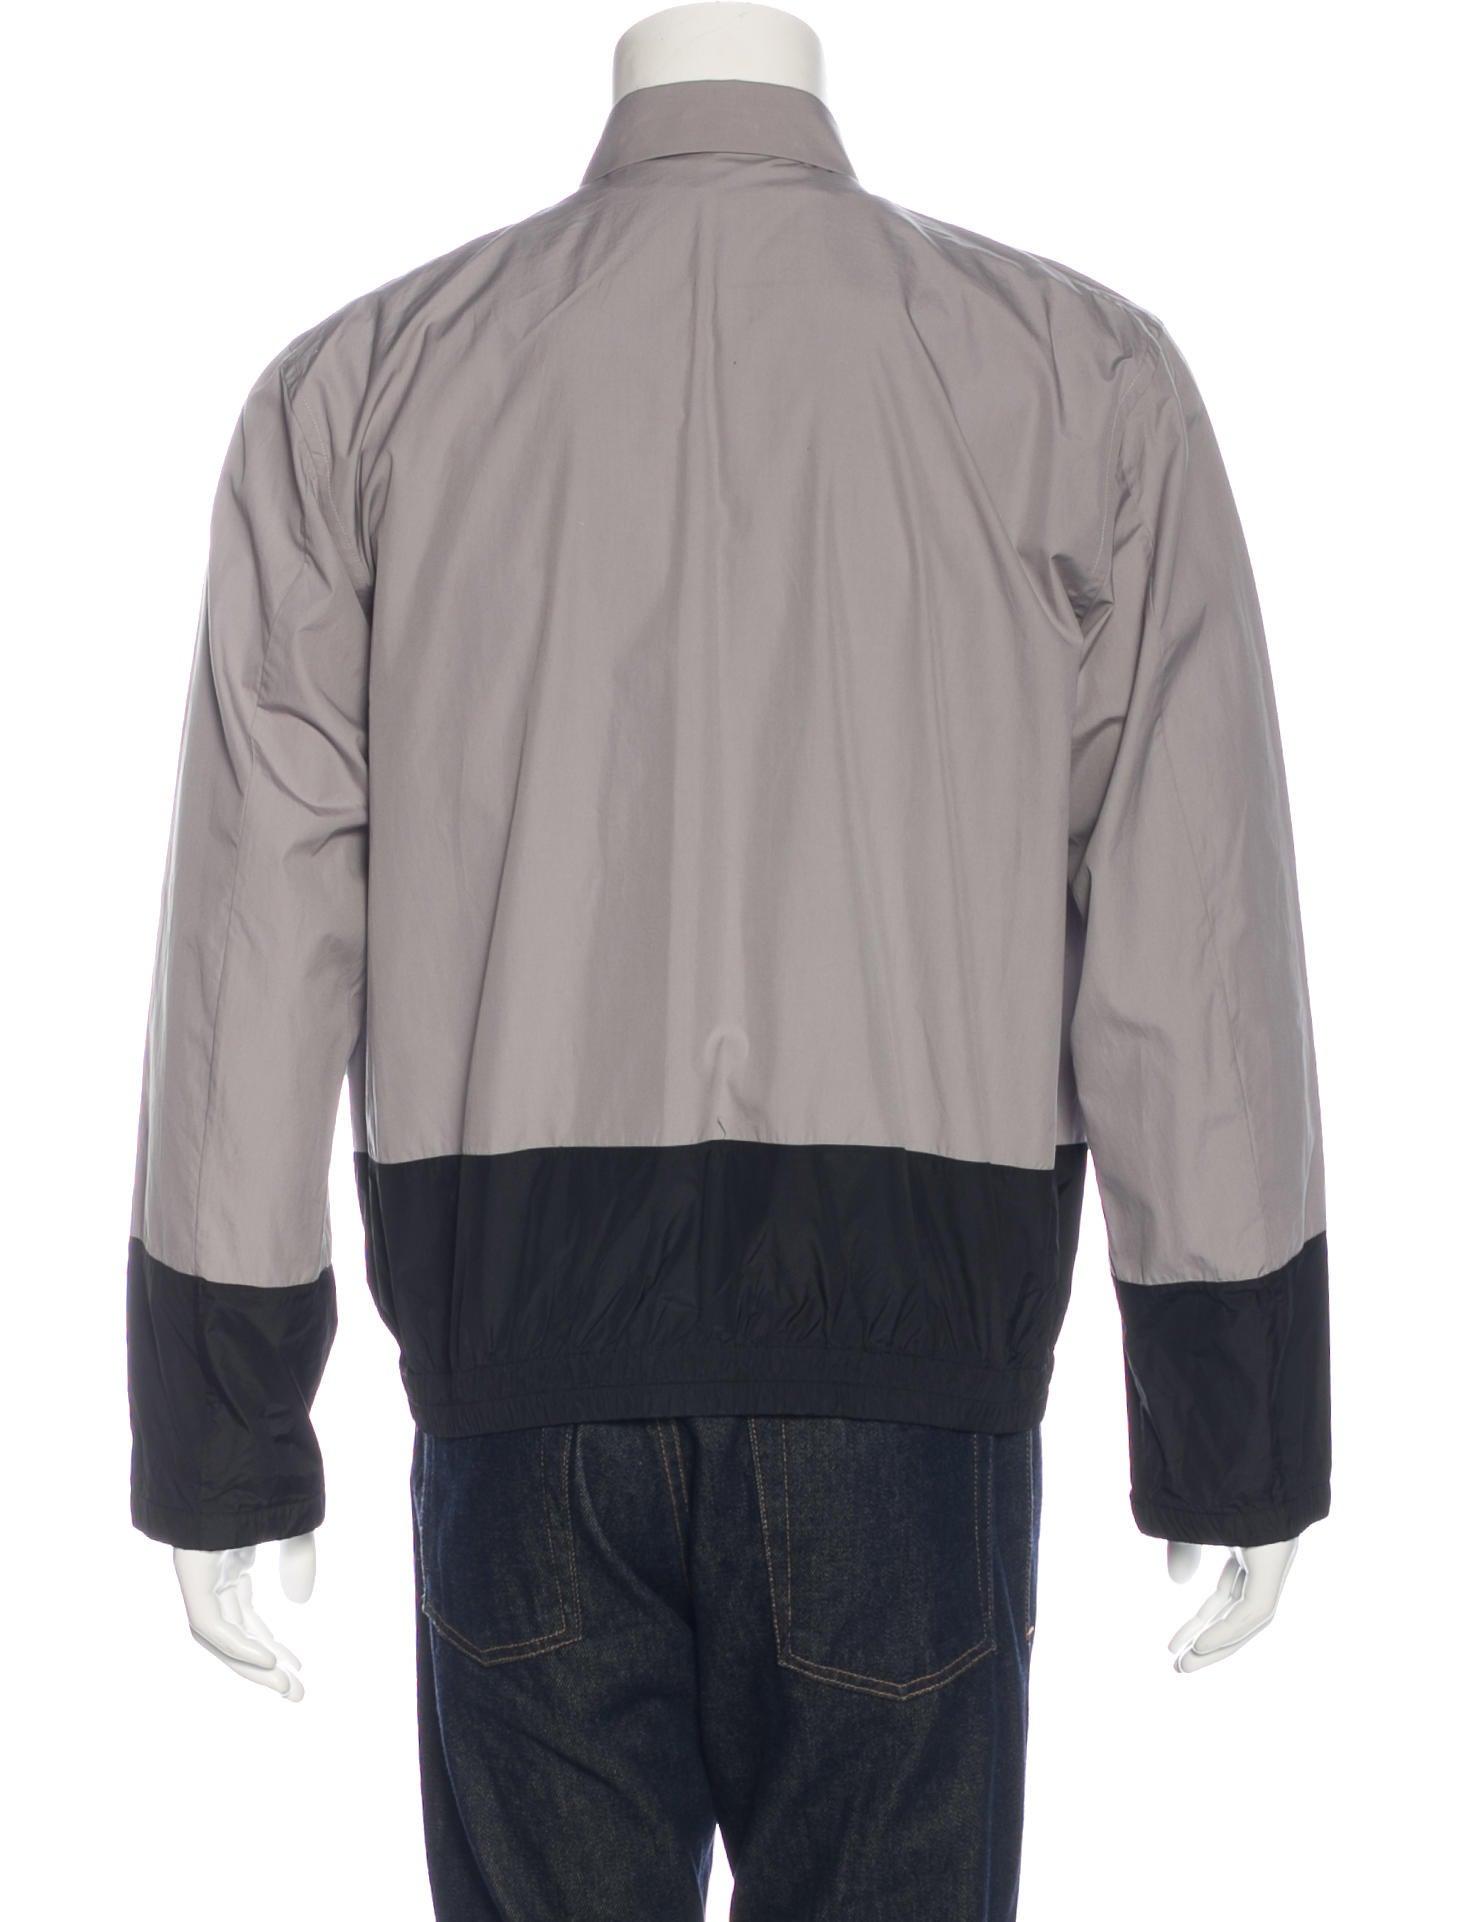 Jil sander colorblock shirt jacket clothing jil38344 for Jil sander mens shirt